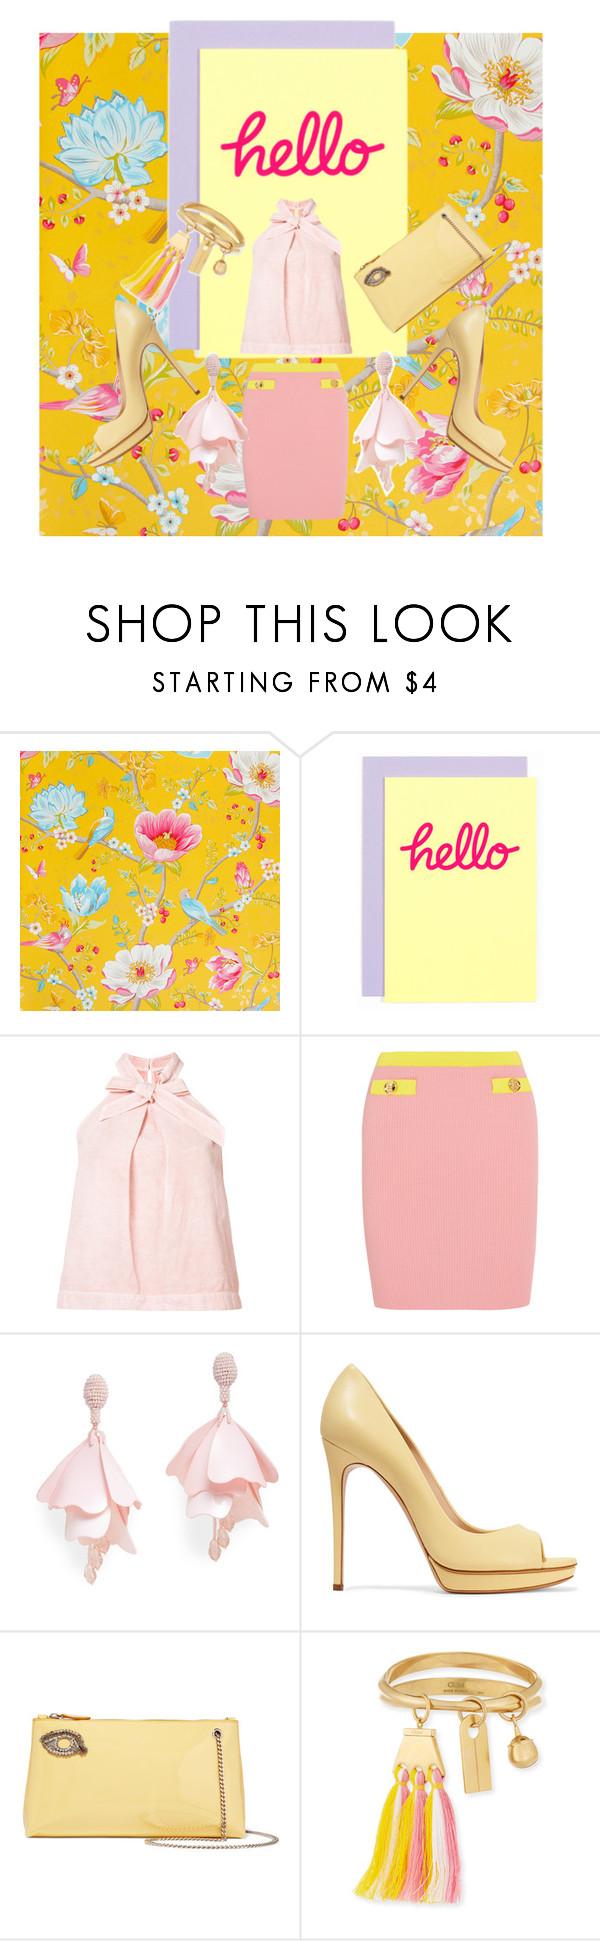 """Hello"" by dudettelucy on Polyvore featuring PiP Studio, Berylune, Ulla Johnson, Boutique Moschino, Oscar de la Renta Pink Label, Casadei, Rochas, Chloé, Spring and prettyinpink"